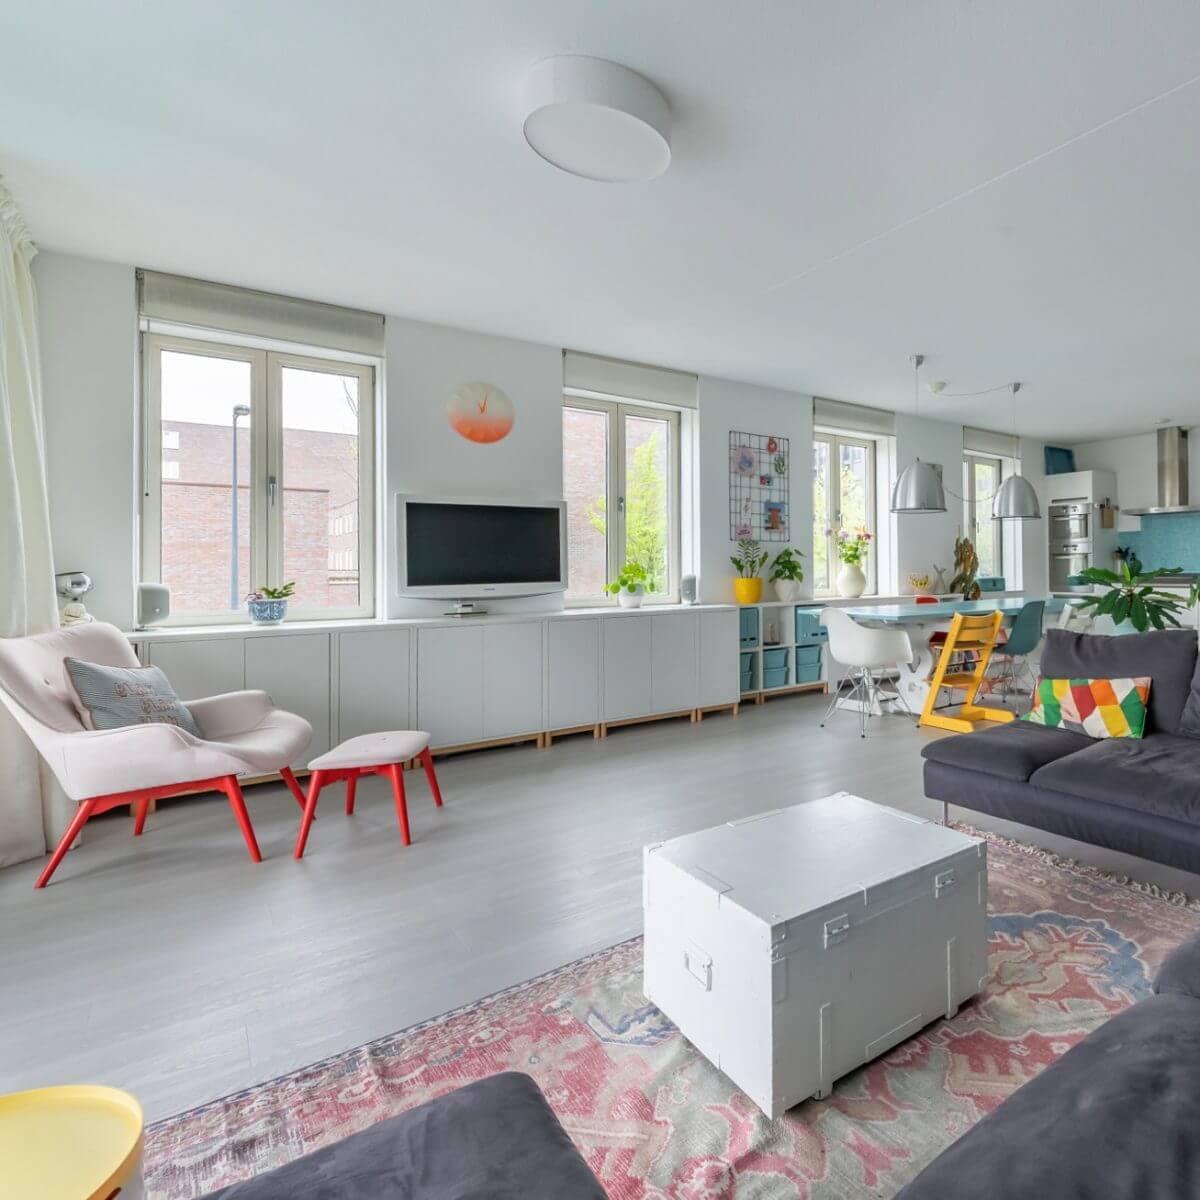 Ikea Hack: Eket verwarmingsombouw en dressoir in kleurrijke woonkamer. Eket heating conversion and sideboard dresser cupboard